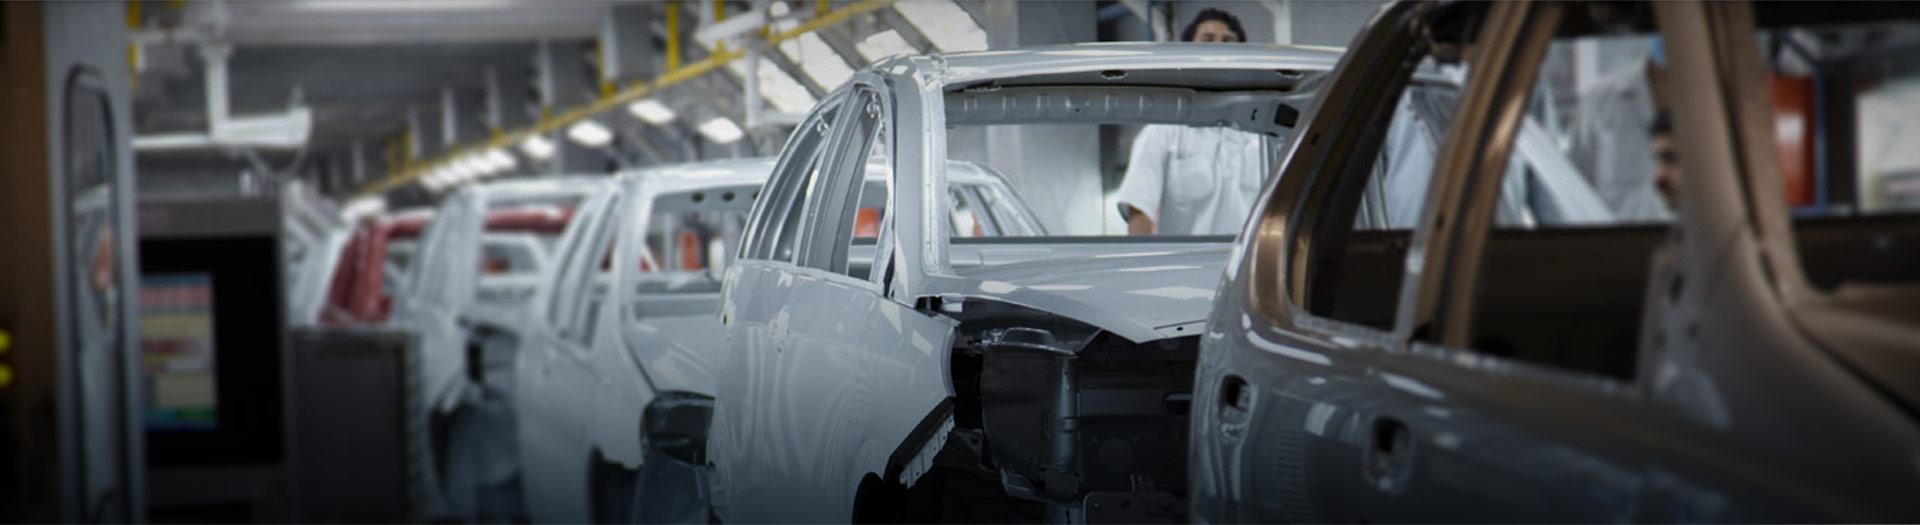 Tata Motors car manufacturing plant in India